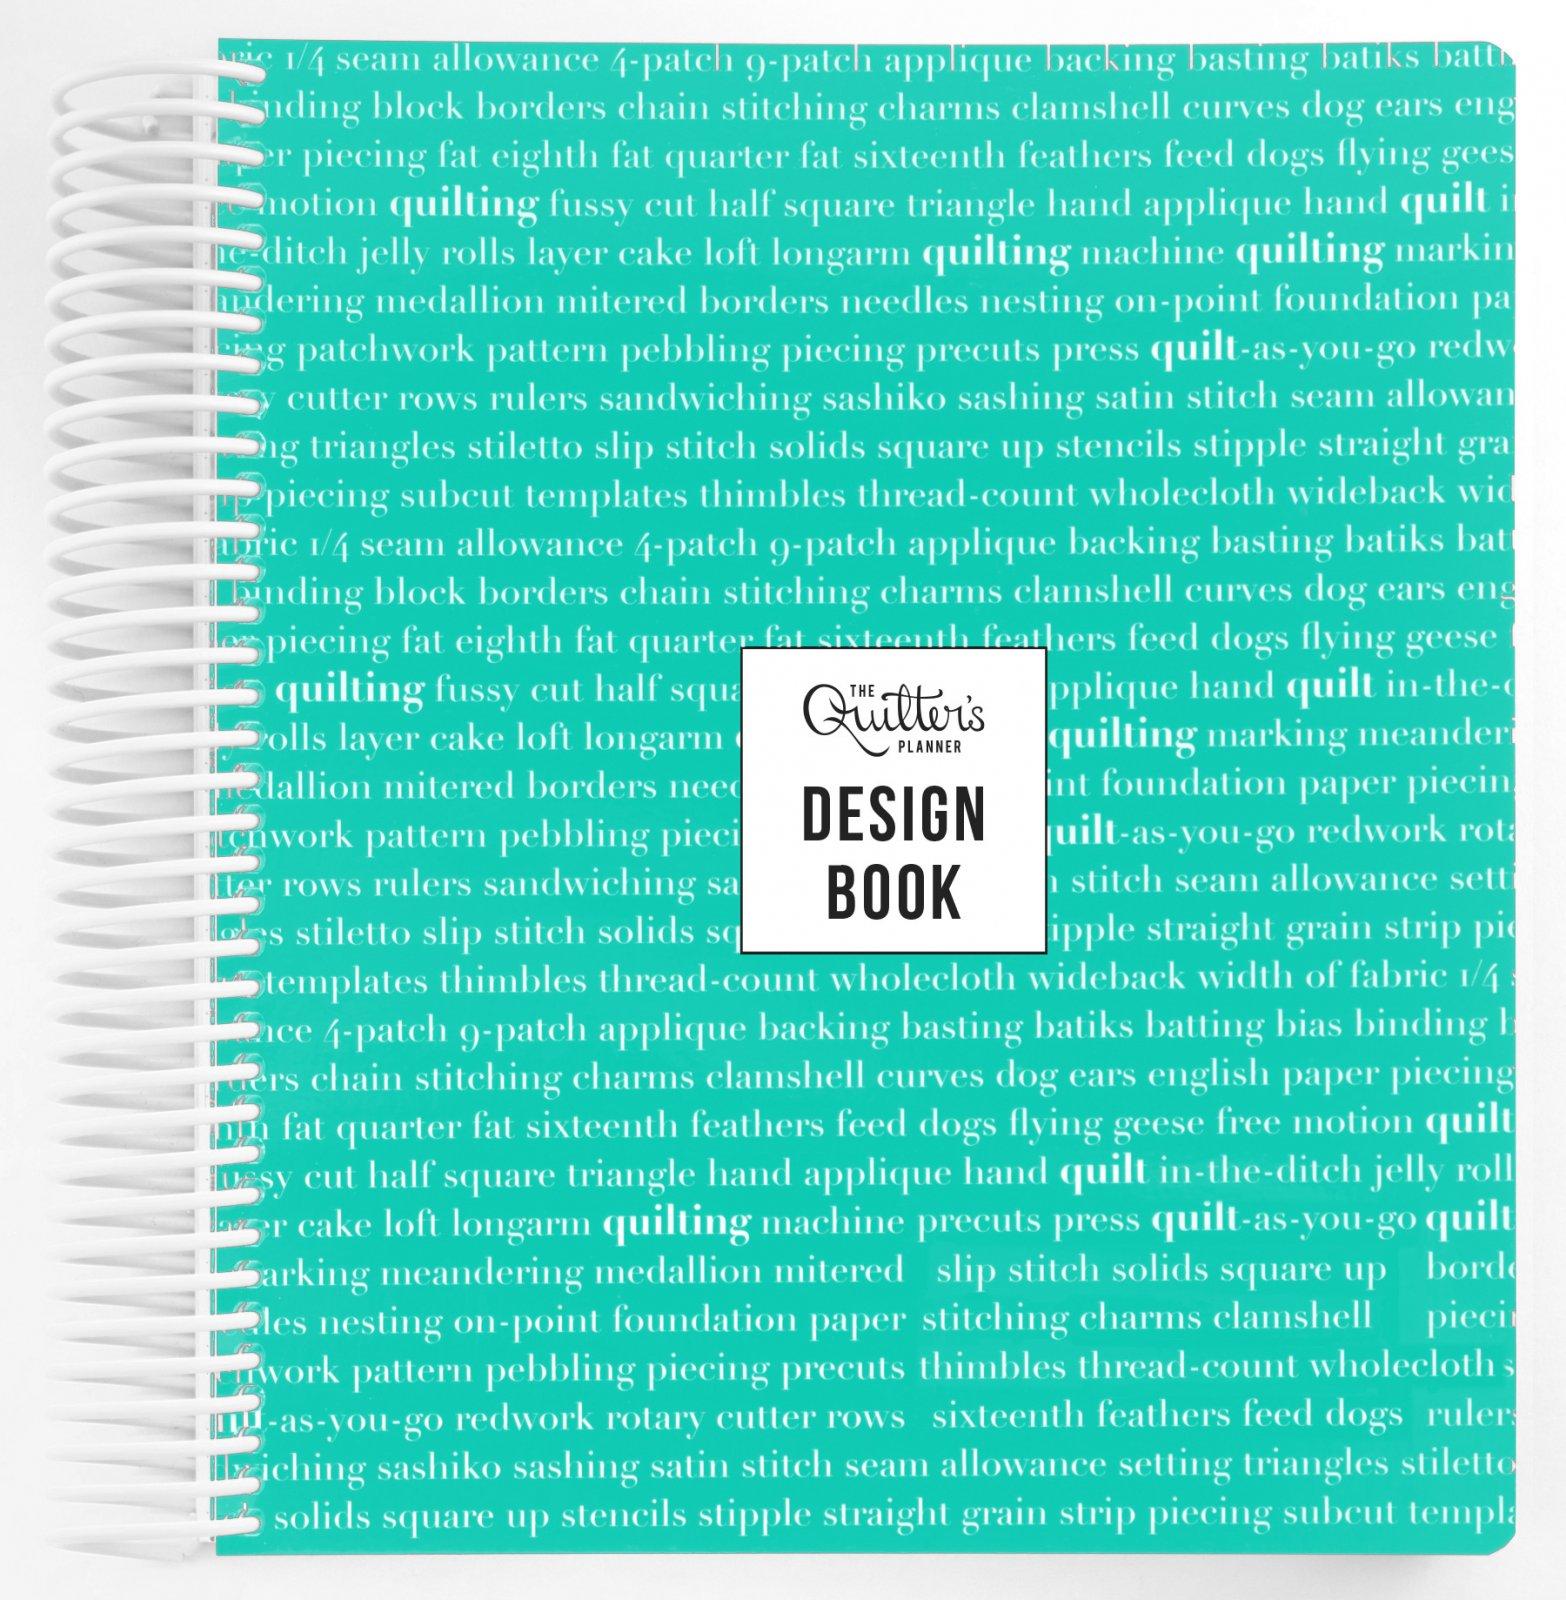 Design Book - 2 Cover Options